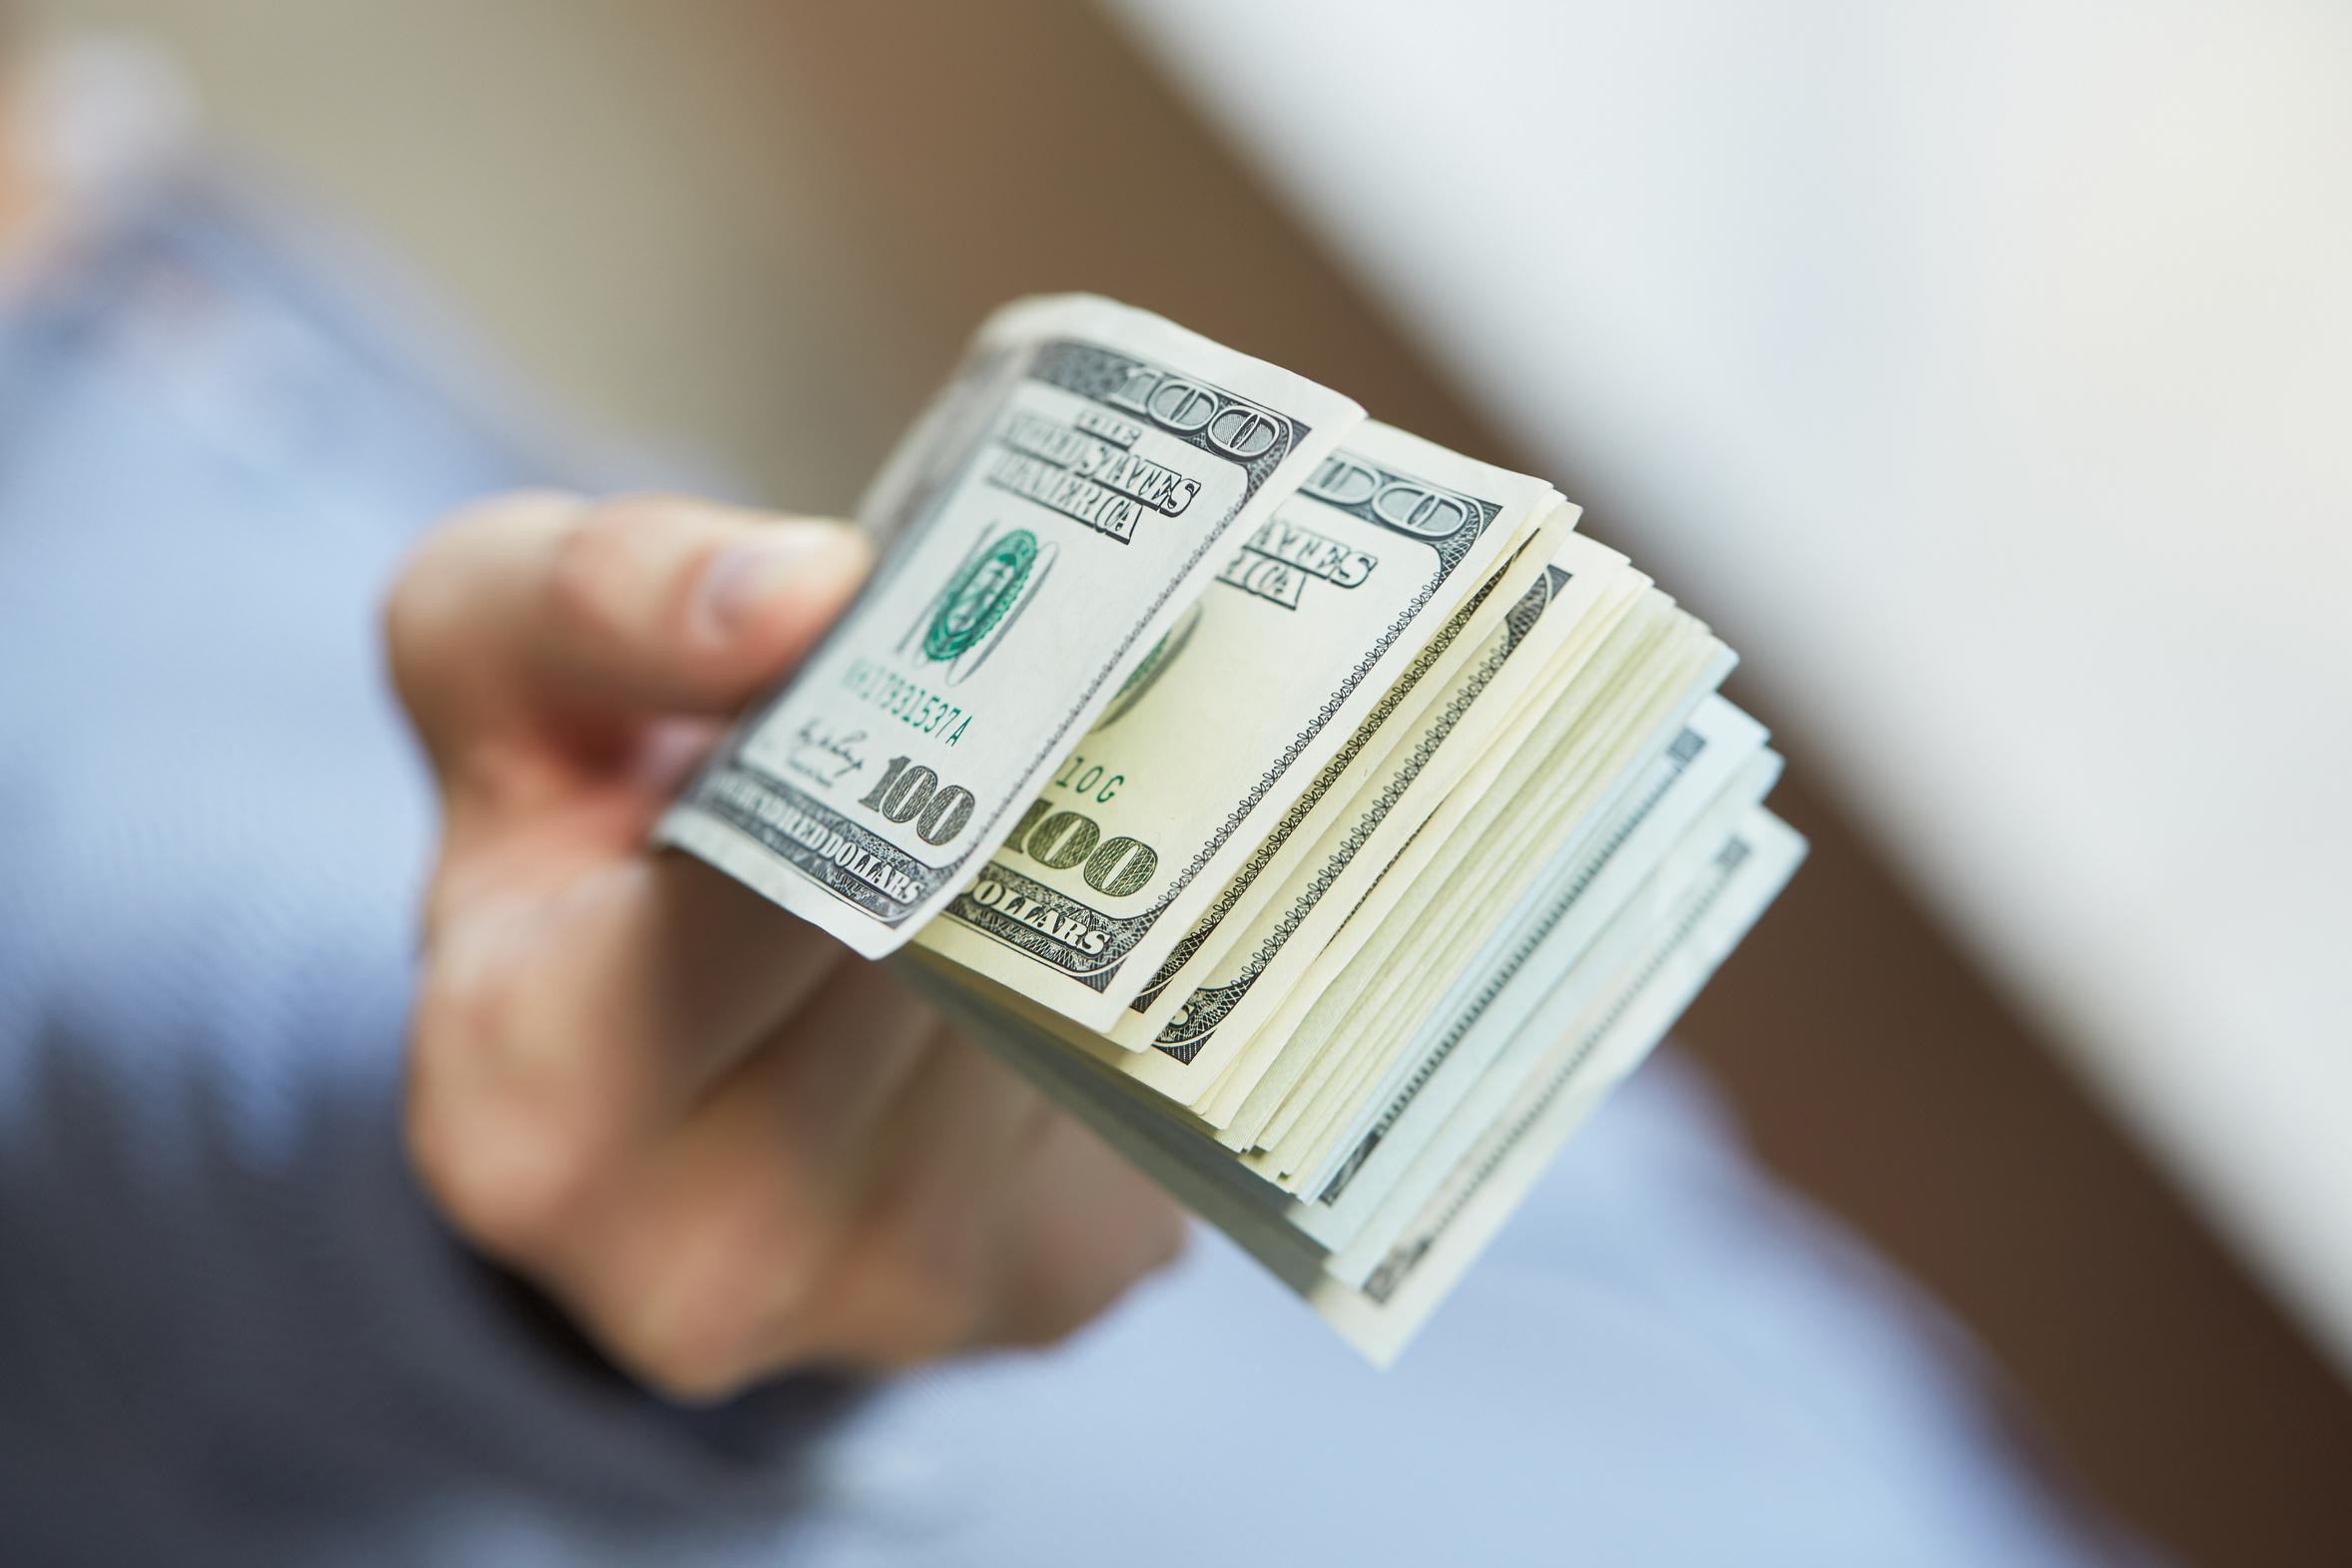 House Scrutinizes Hurricane Prep Cash